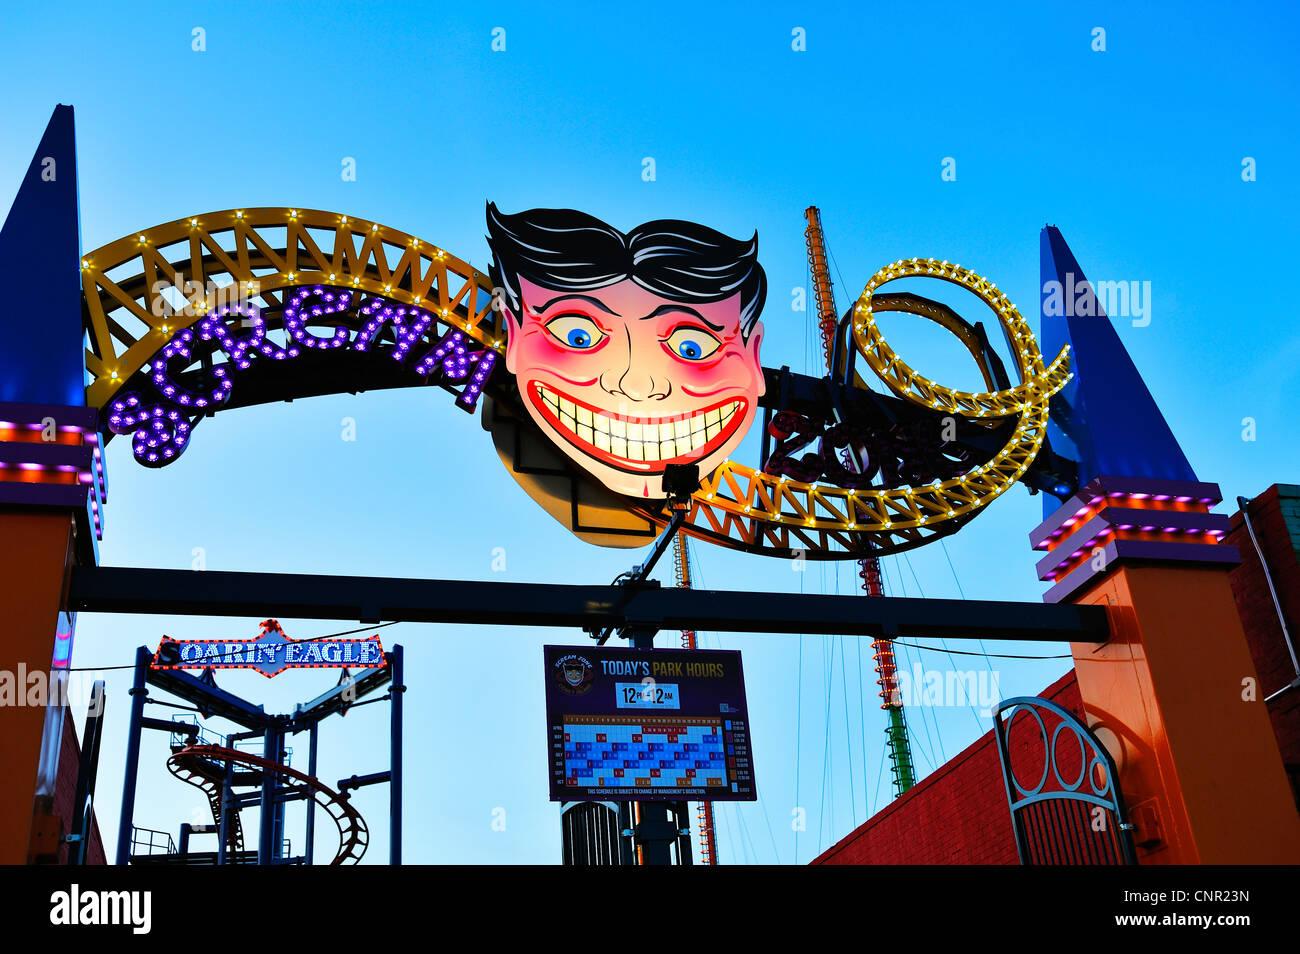 Coney Island Amusement Park - Stock Image